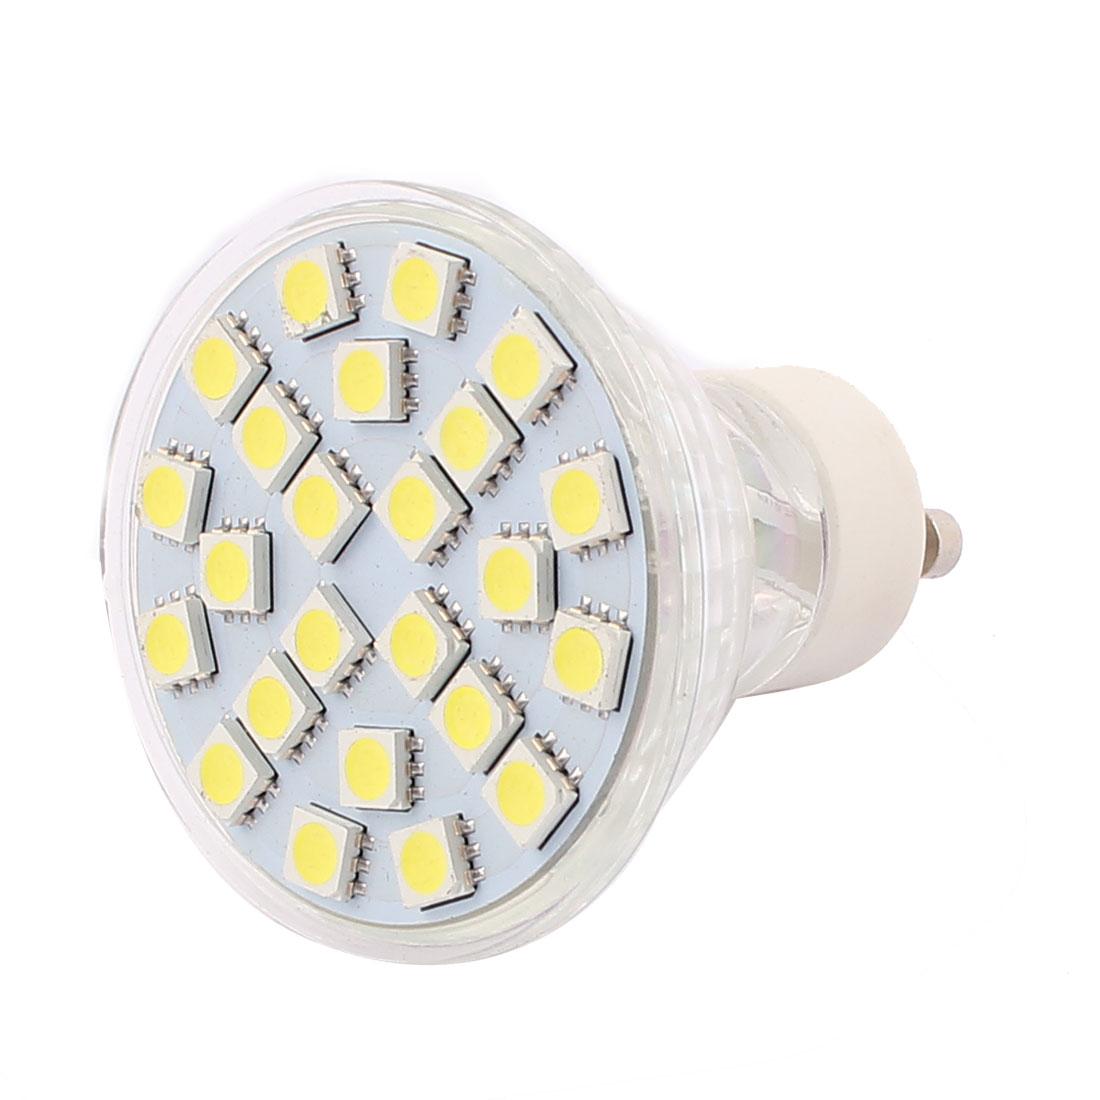 GU10 SMD 5050 24 LEDs Glass Energy Saving LED Lamp Bulb White AC 220V 3W